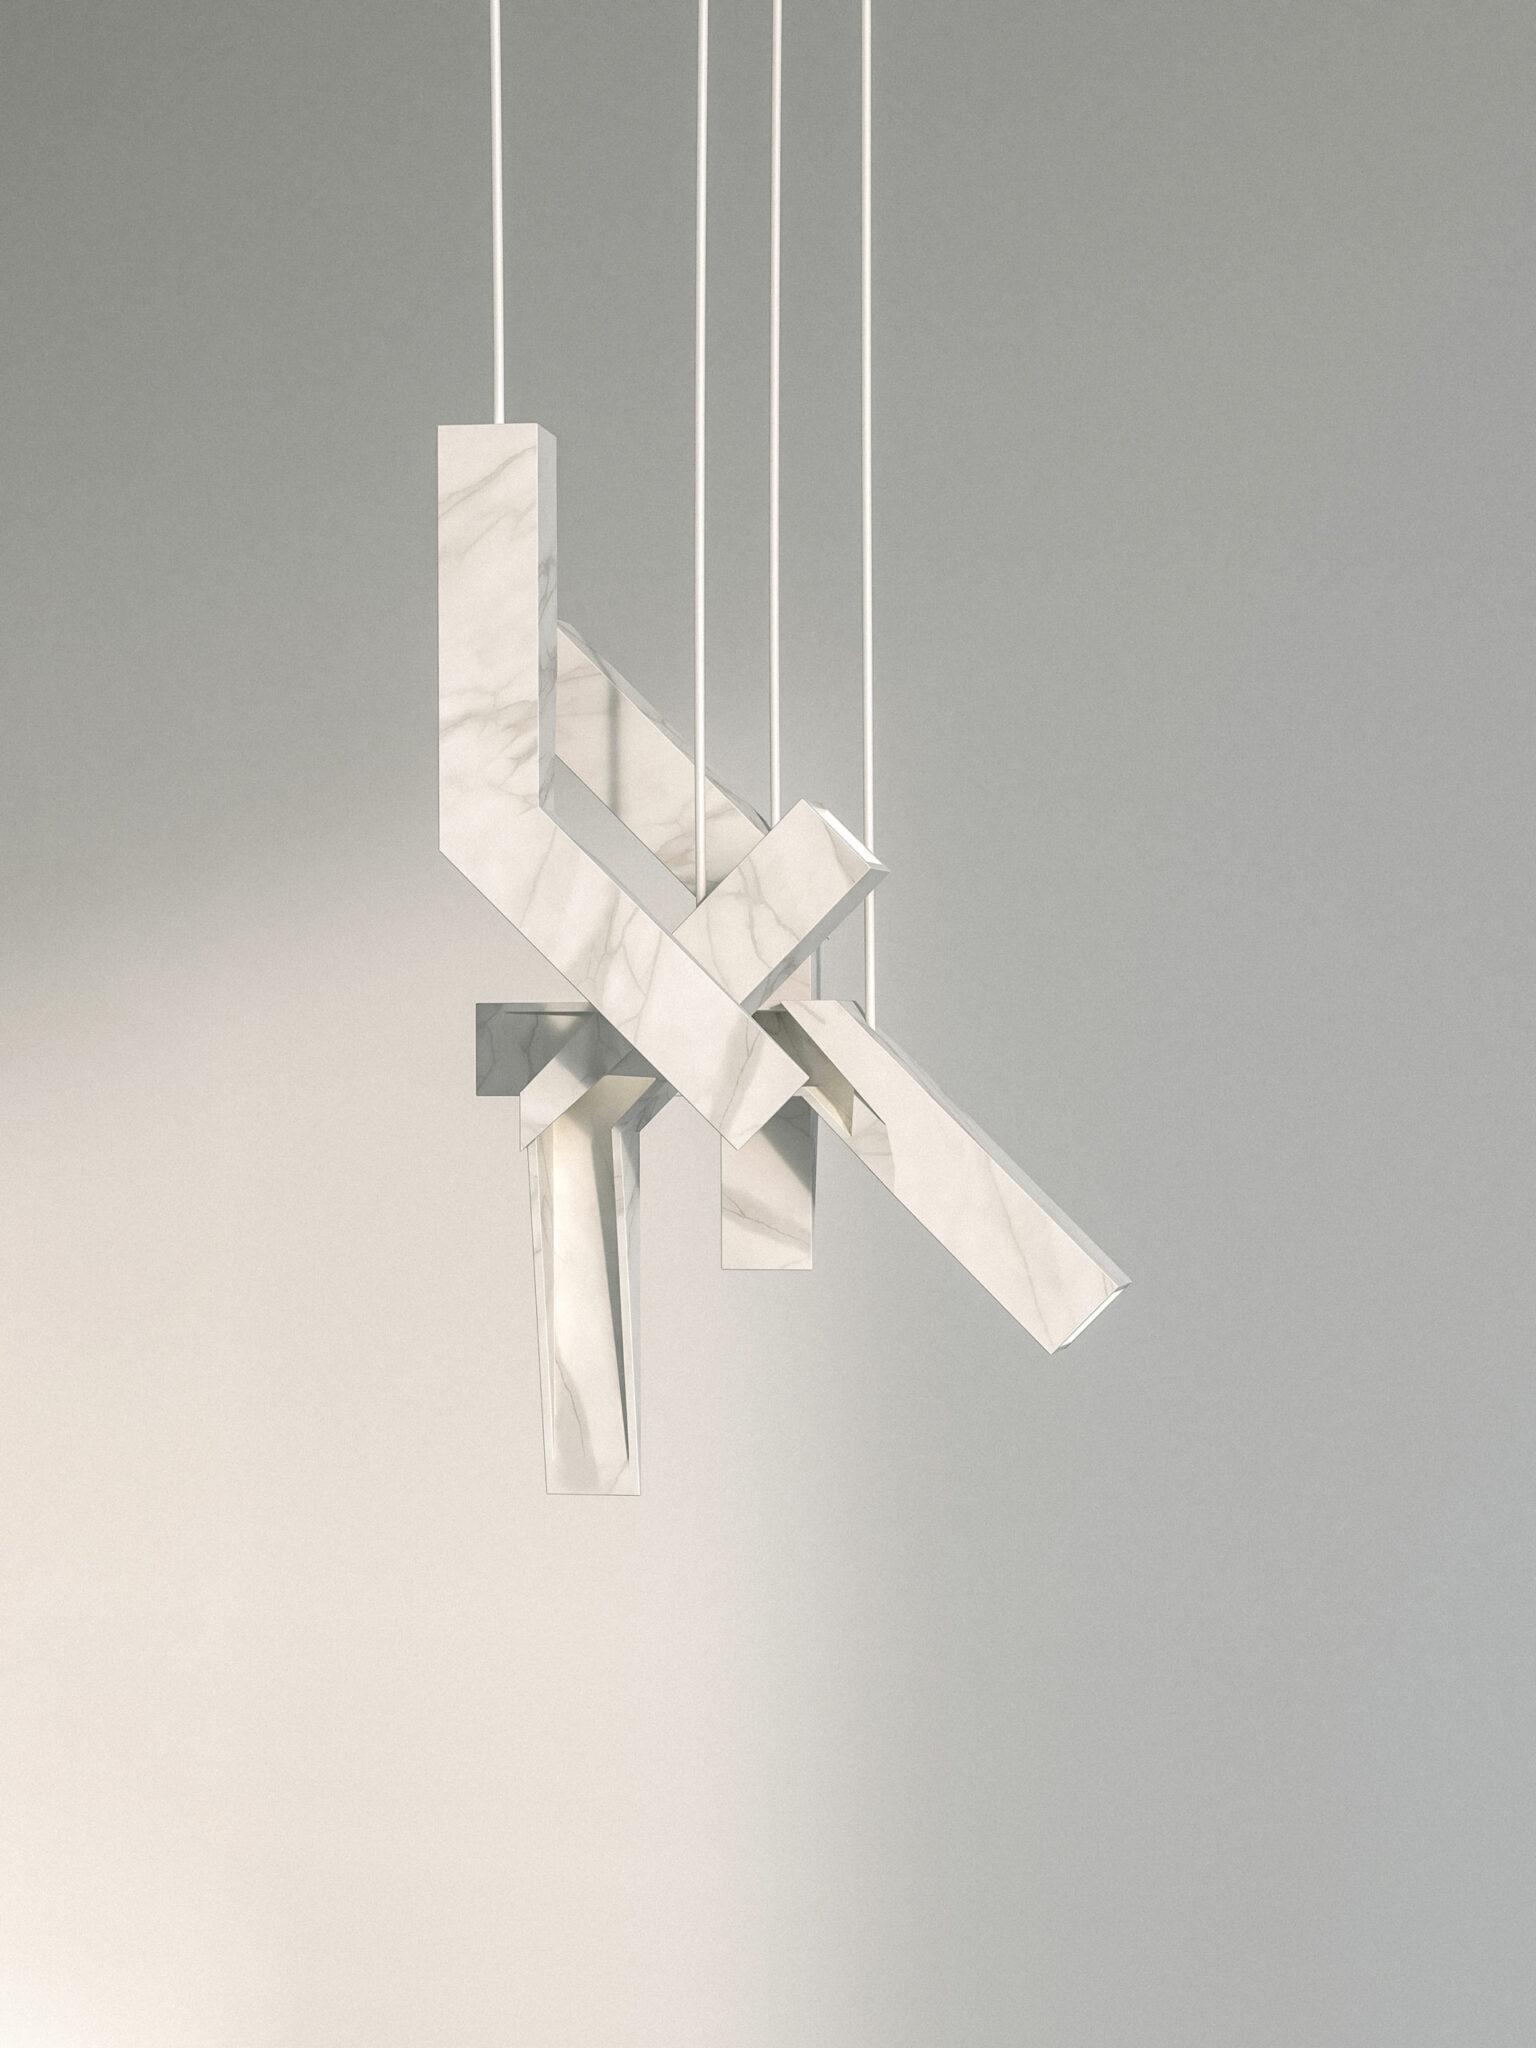 A Cut - Marble suspension lamp